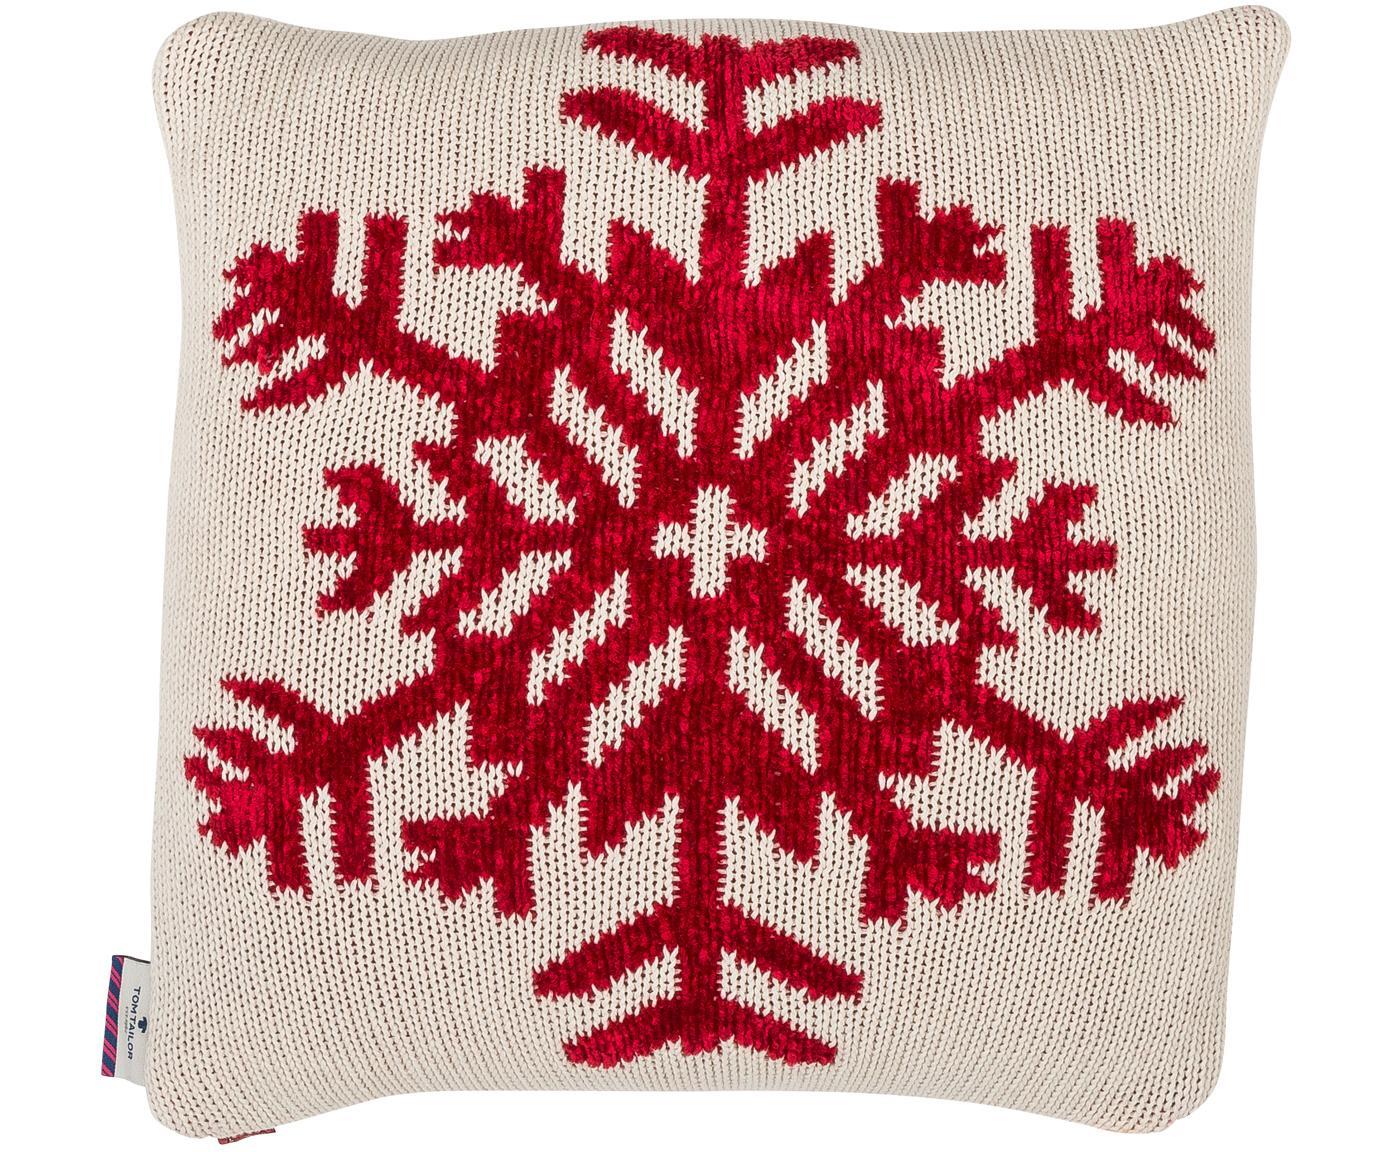 Strick-Kissenhülle Snowflake in Weiß/Rot, Baumwolle, Weiß, Rot, 40 x 40 cm